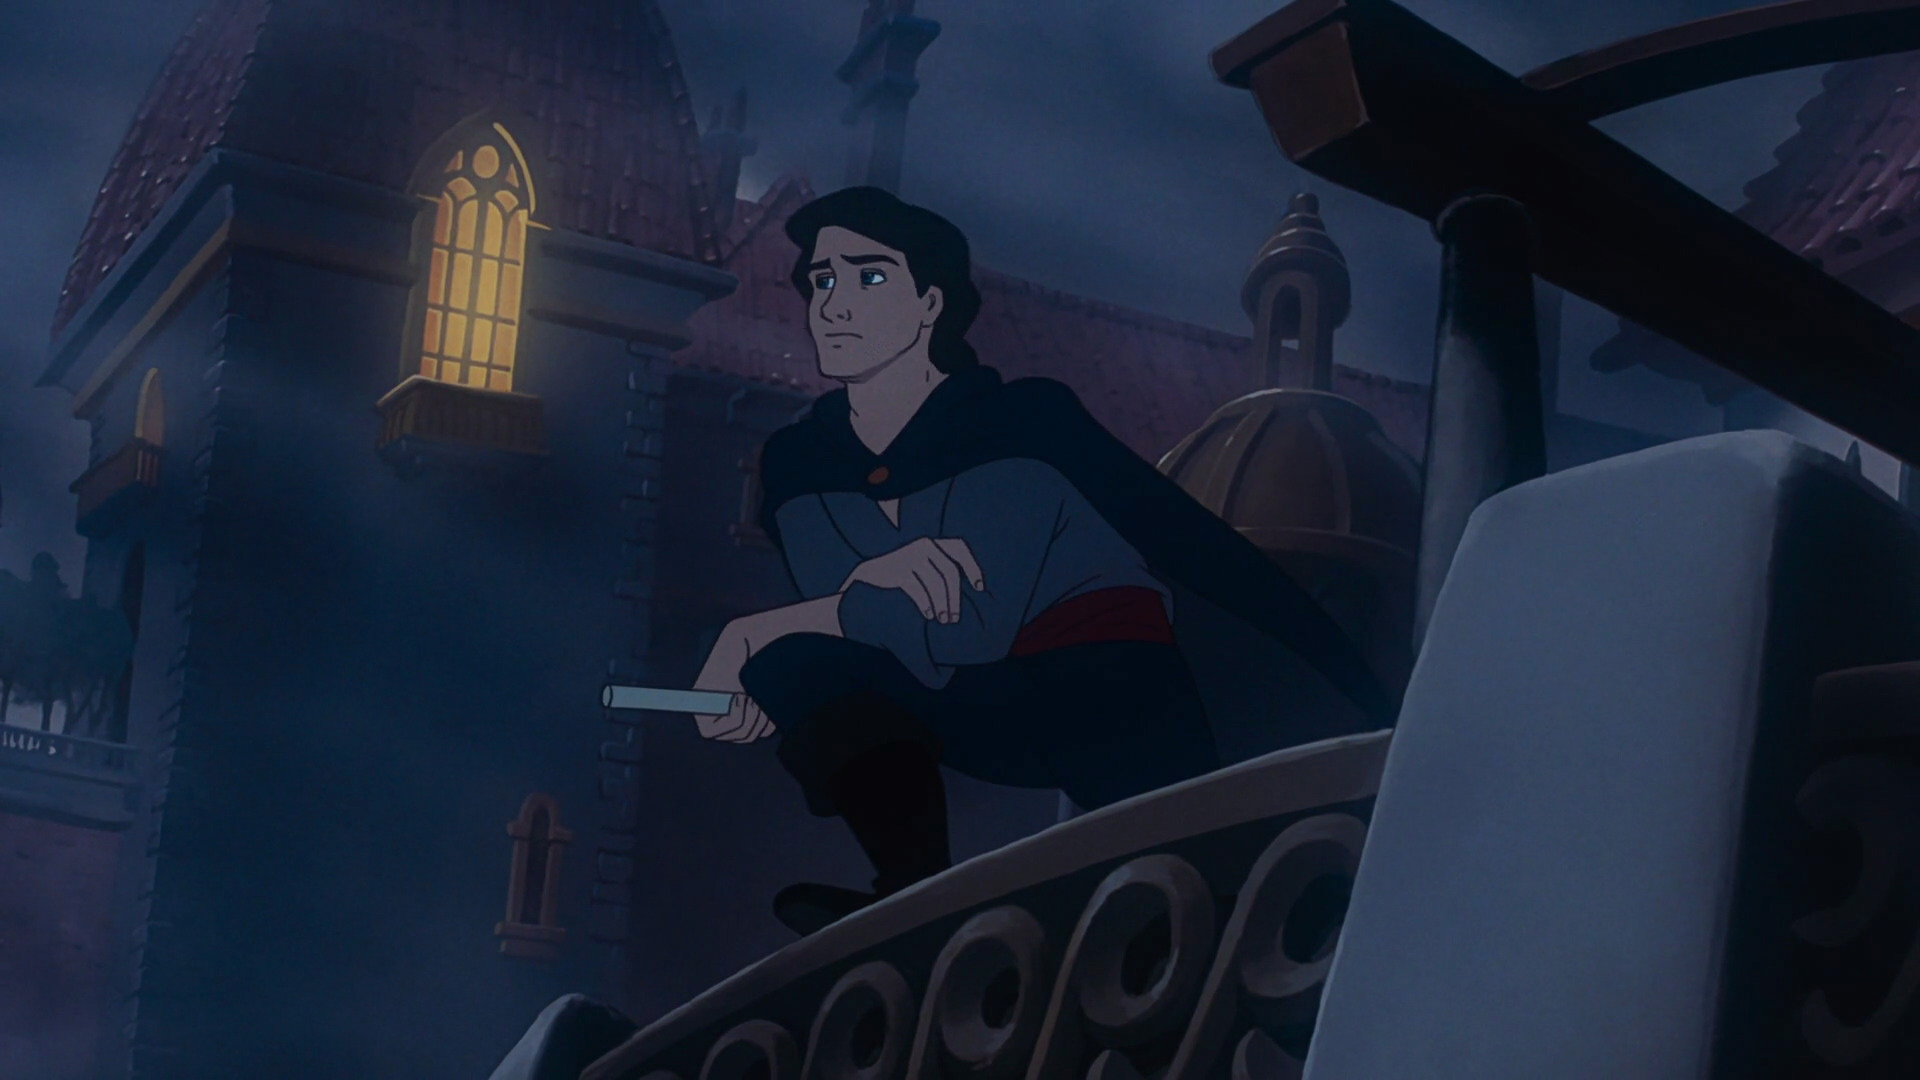 Le prince eric personnage dans la petite sir ne disney planet - Image petite sirene ...